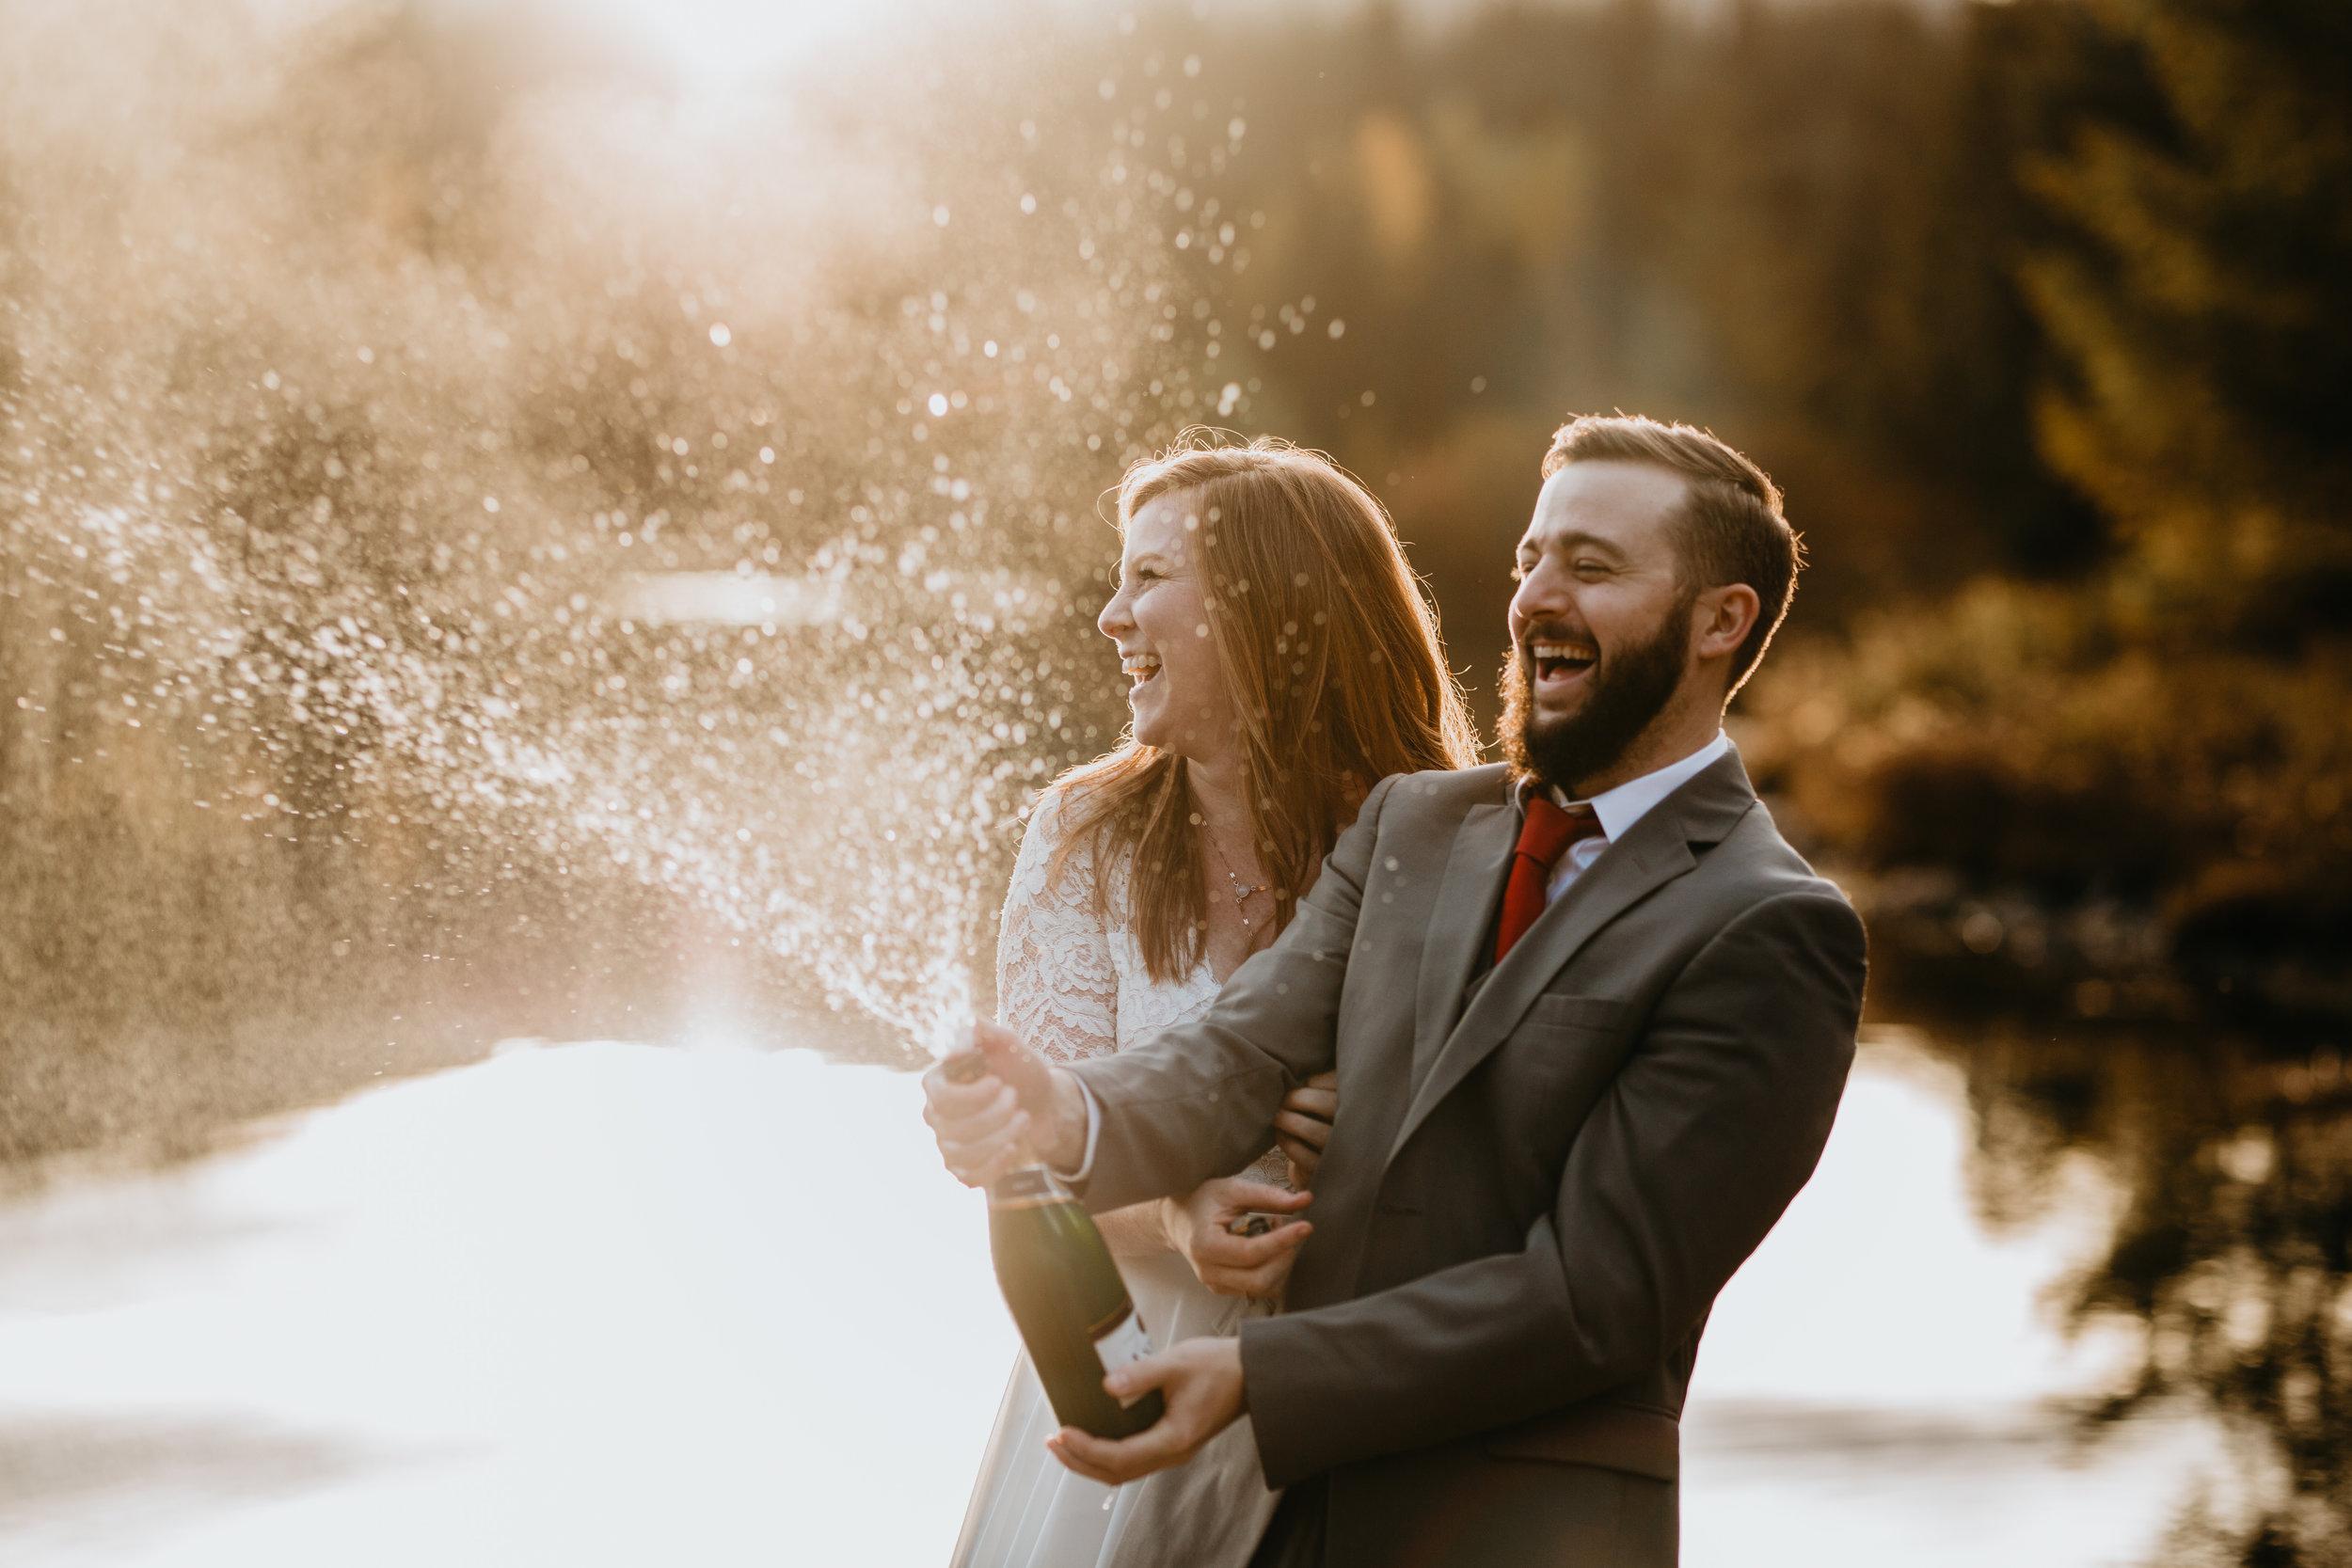 nicole-daacke-photography-mountain-view-elopement-at-gold-creek-pond-snoqualmie-washington-wa-elopement-photographer-photography-adventure-elopement-in-washington-fall-lakeside-golden-sunset-boho-fun-bride-2789.jpg